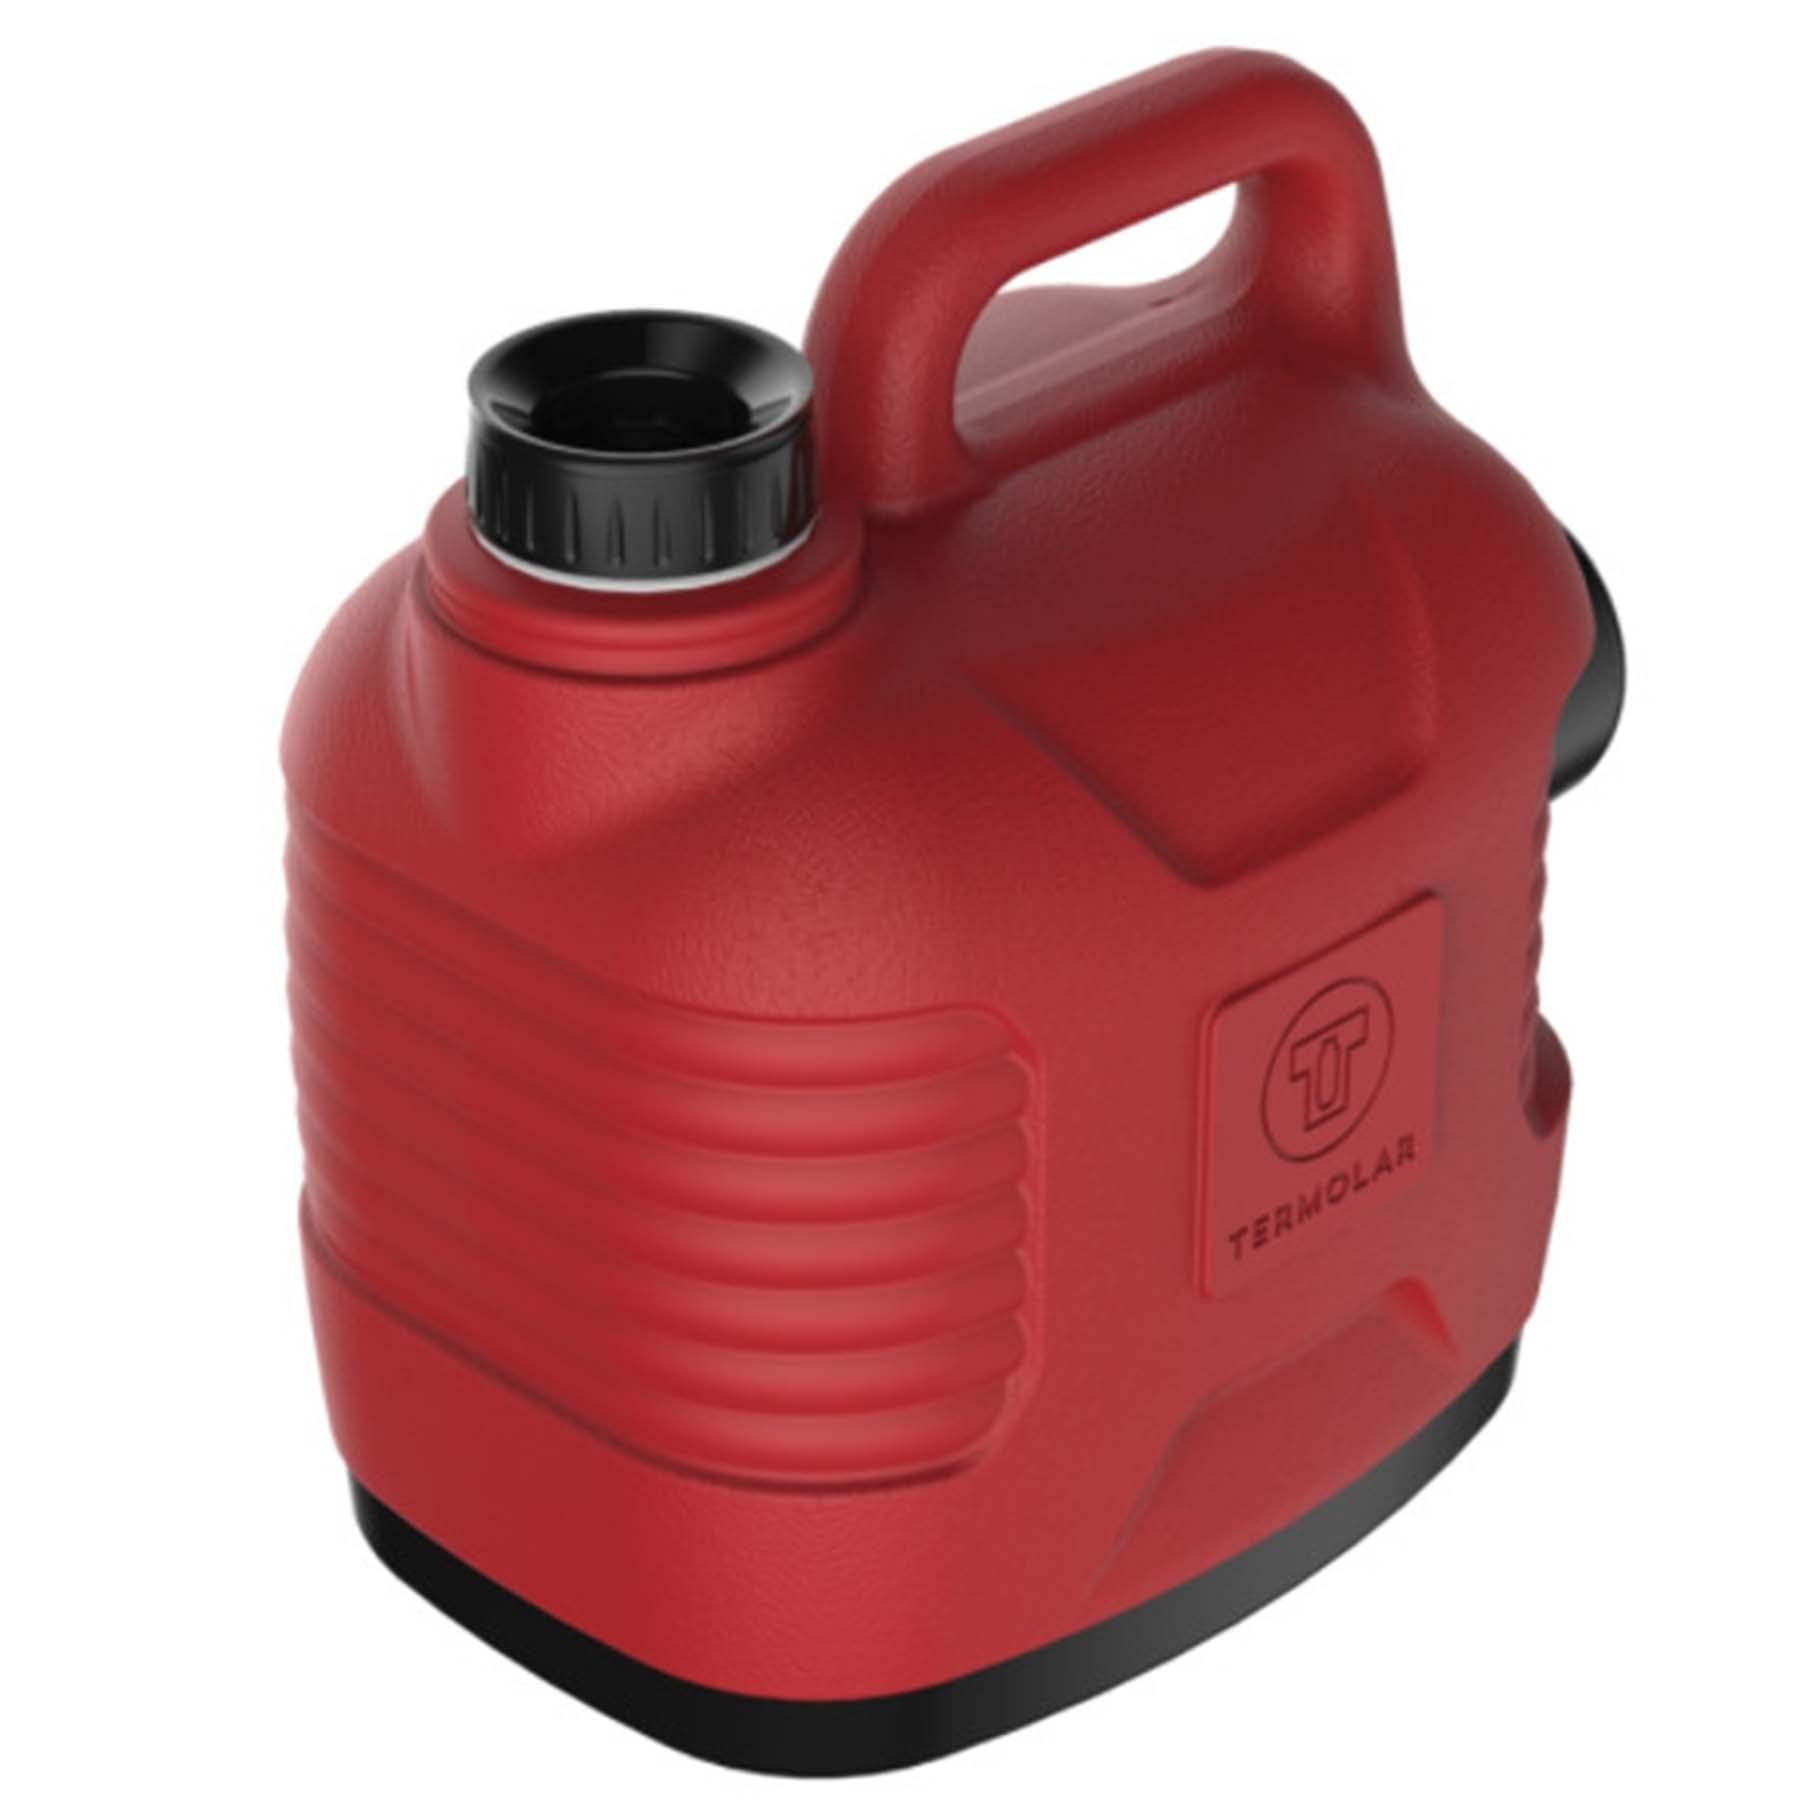 Garrafão Térmico Supertermo Vermelho 5L Termolar 1095VRO